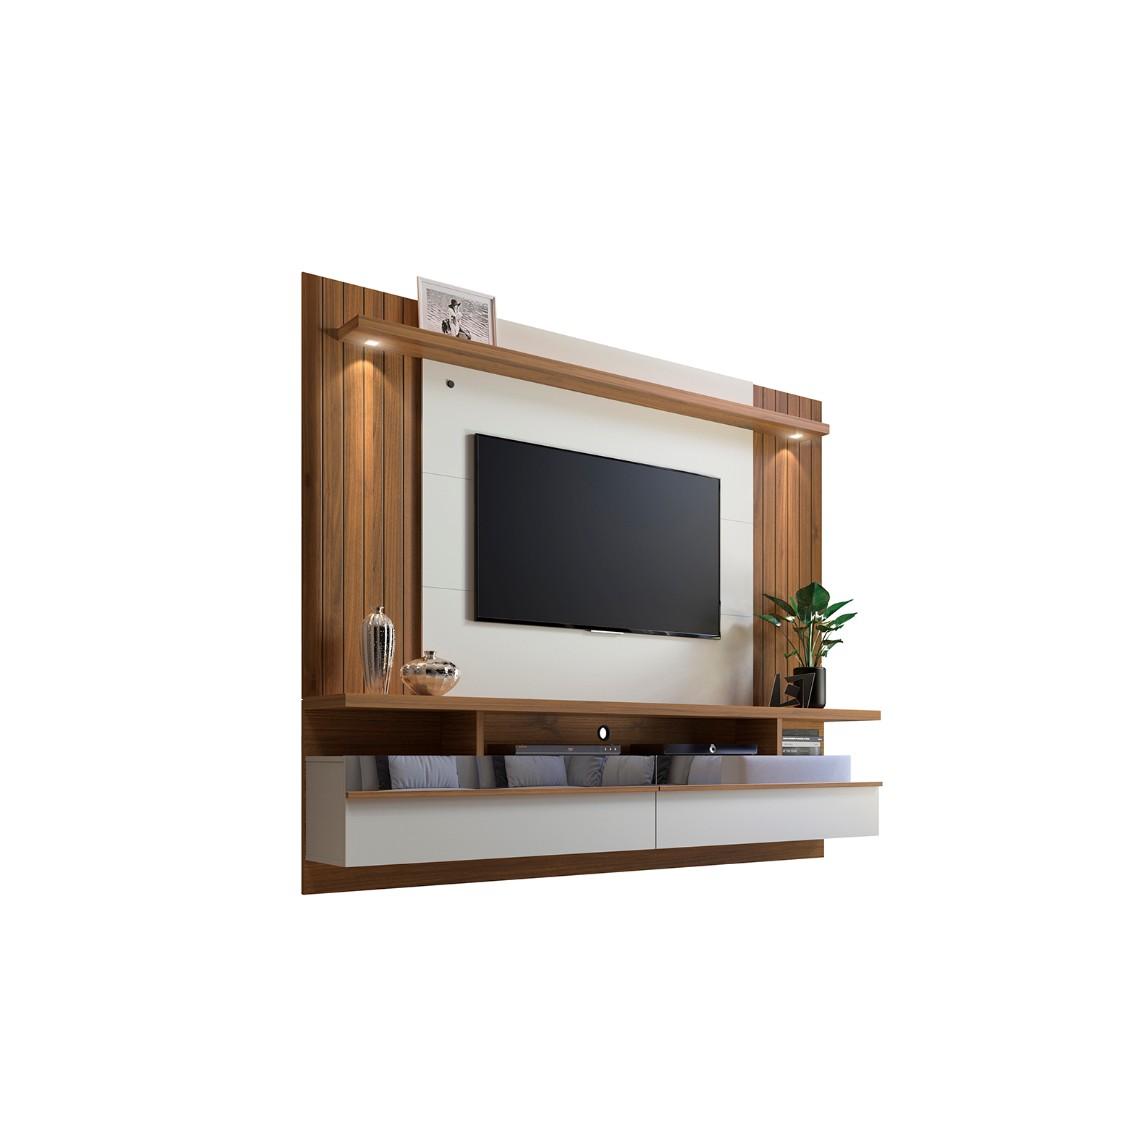 Painel para TV Sao Luis 33cm x 185cm Off white - Linea Mo